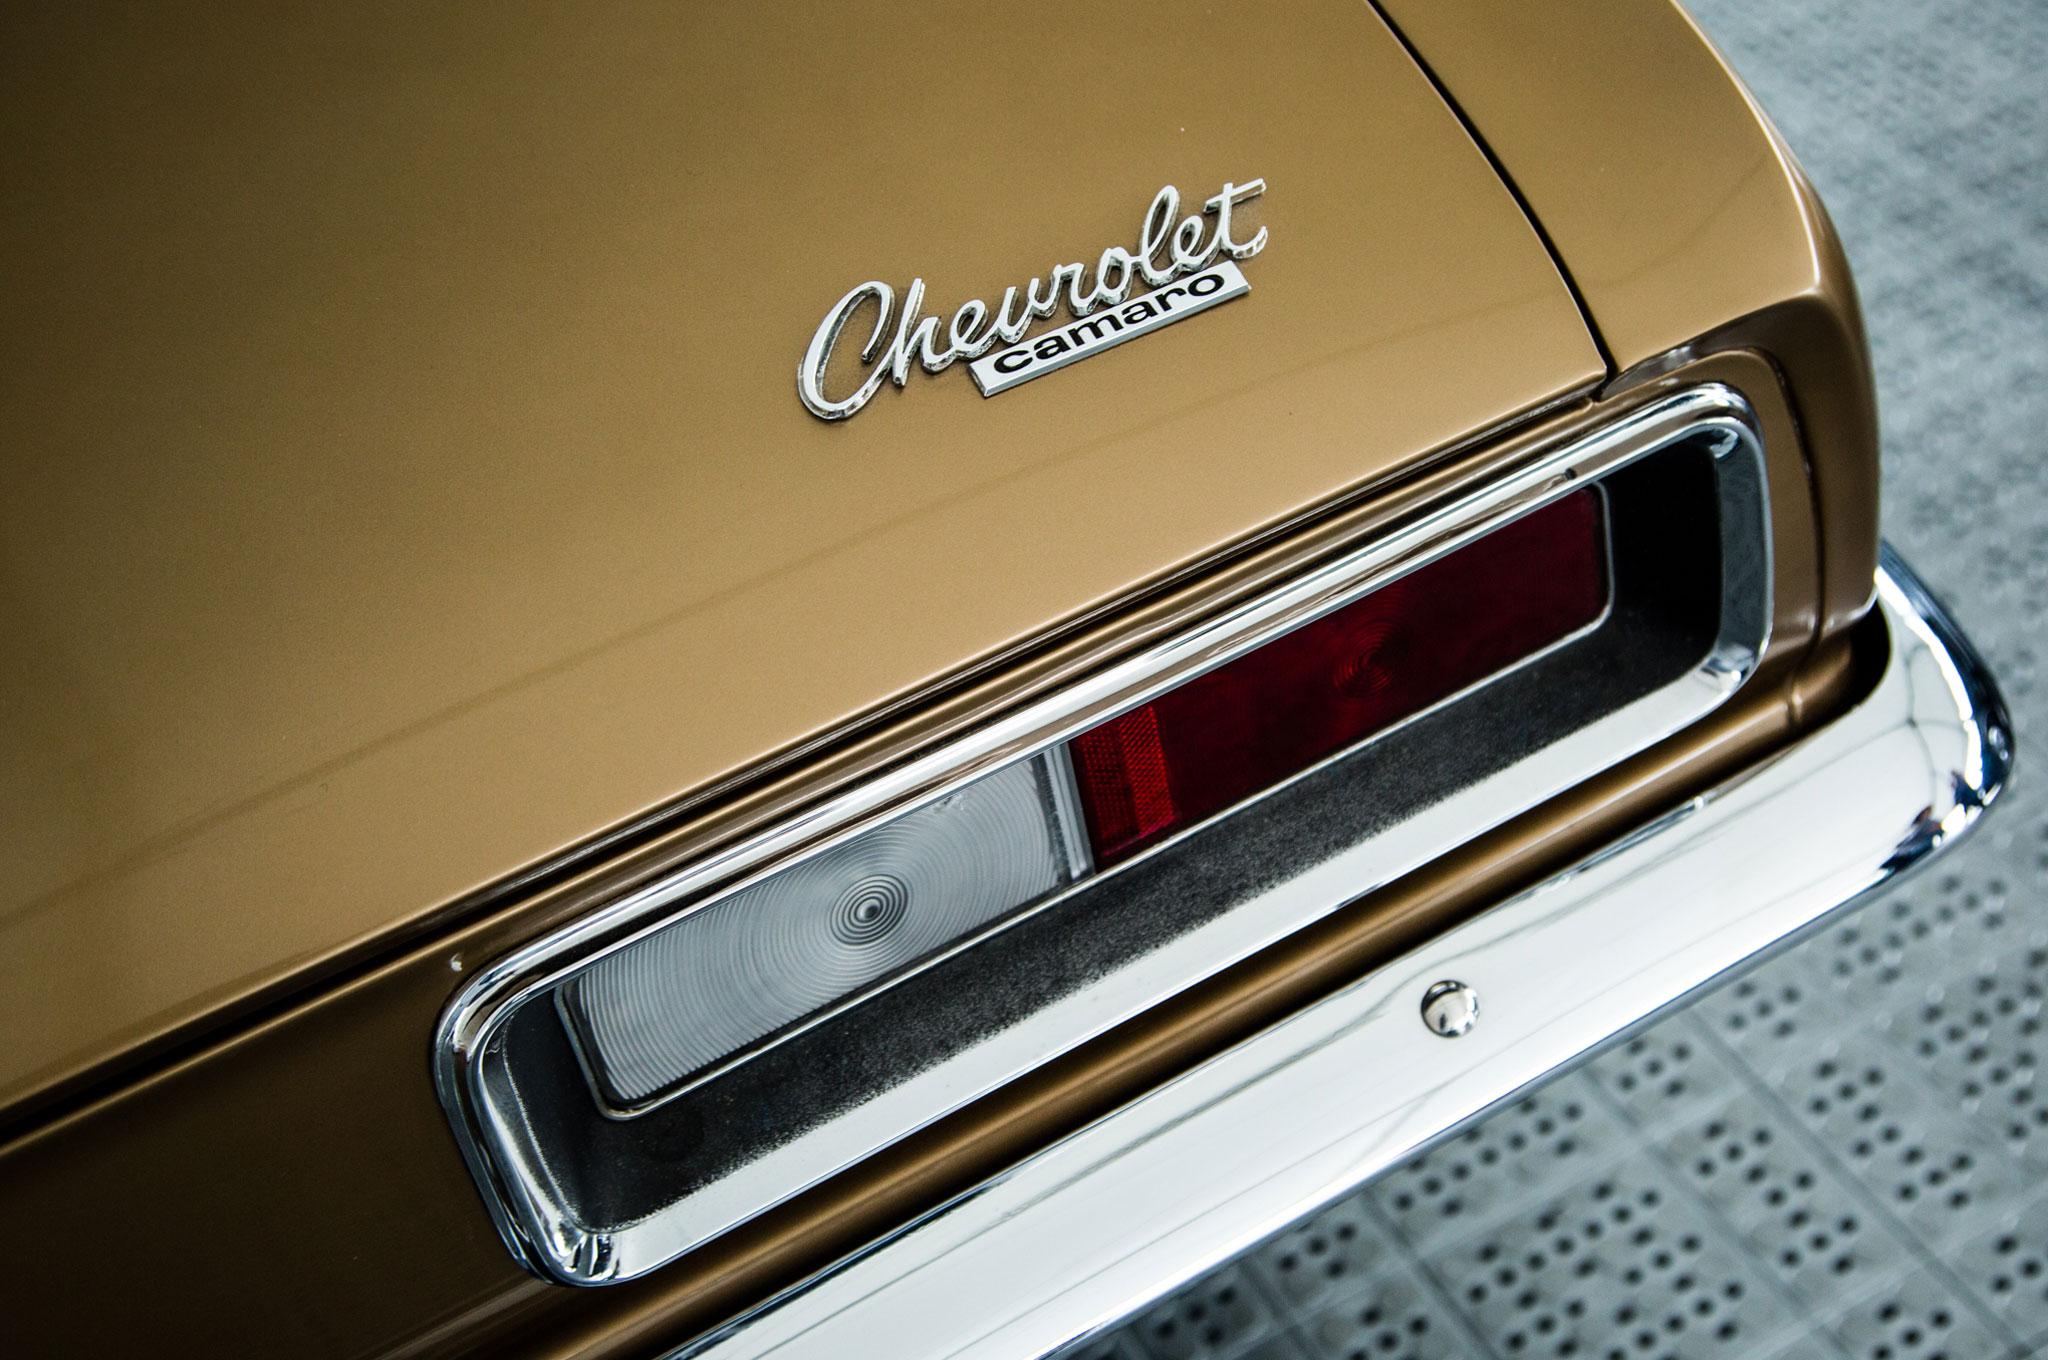 1967 Chevrolet Camaro VIN 1000001 3